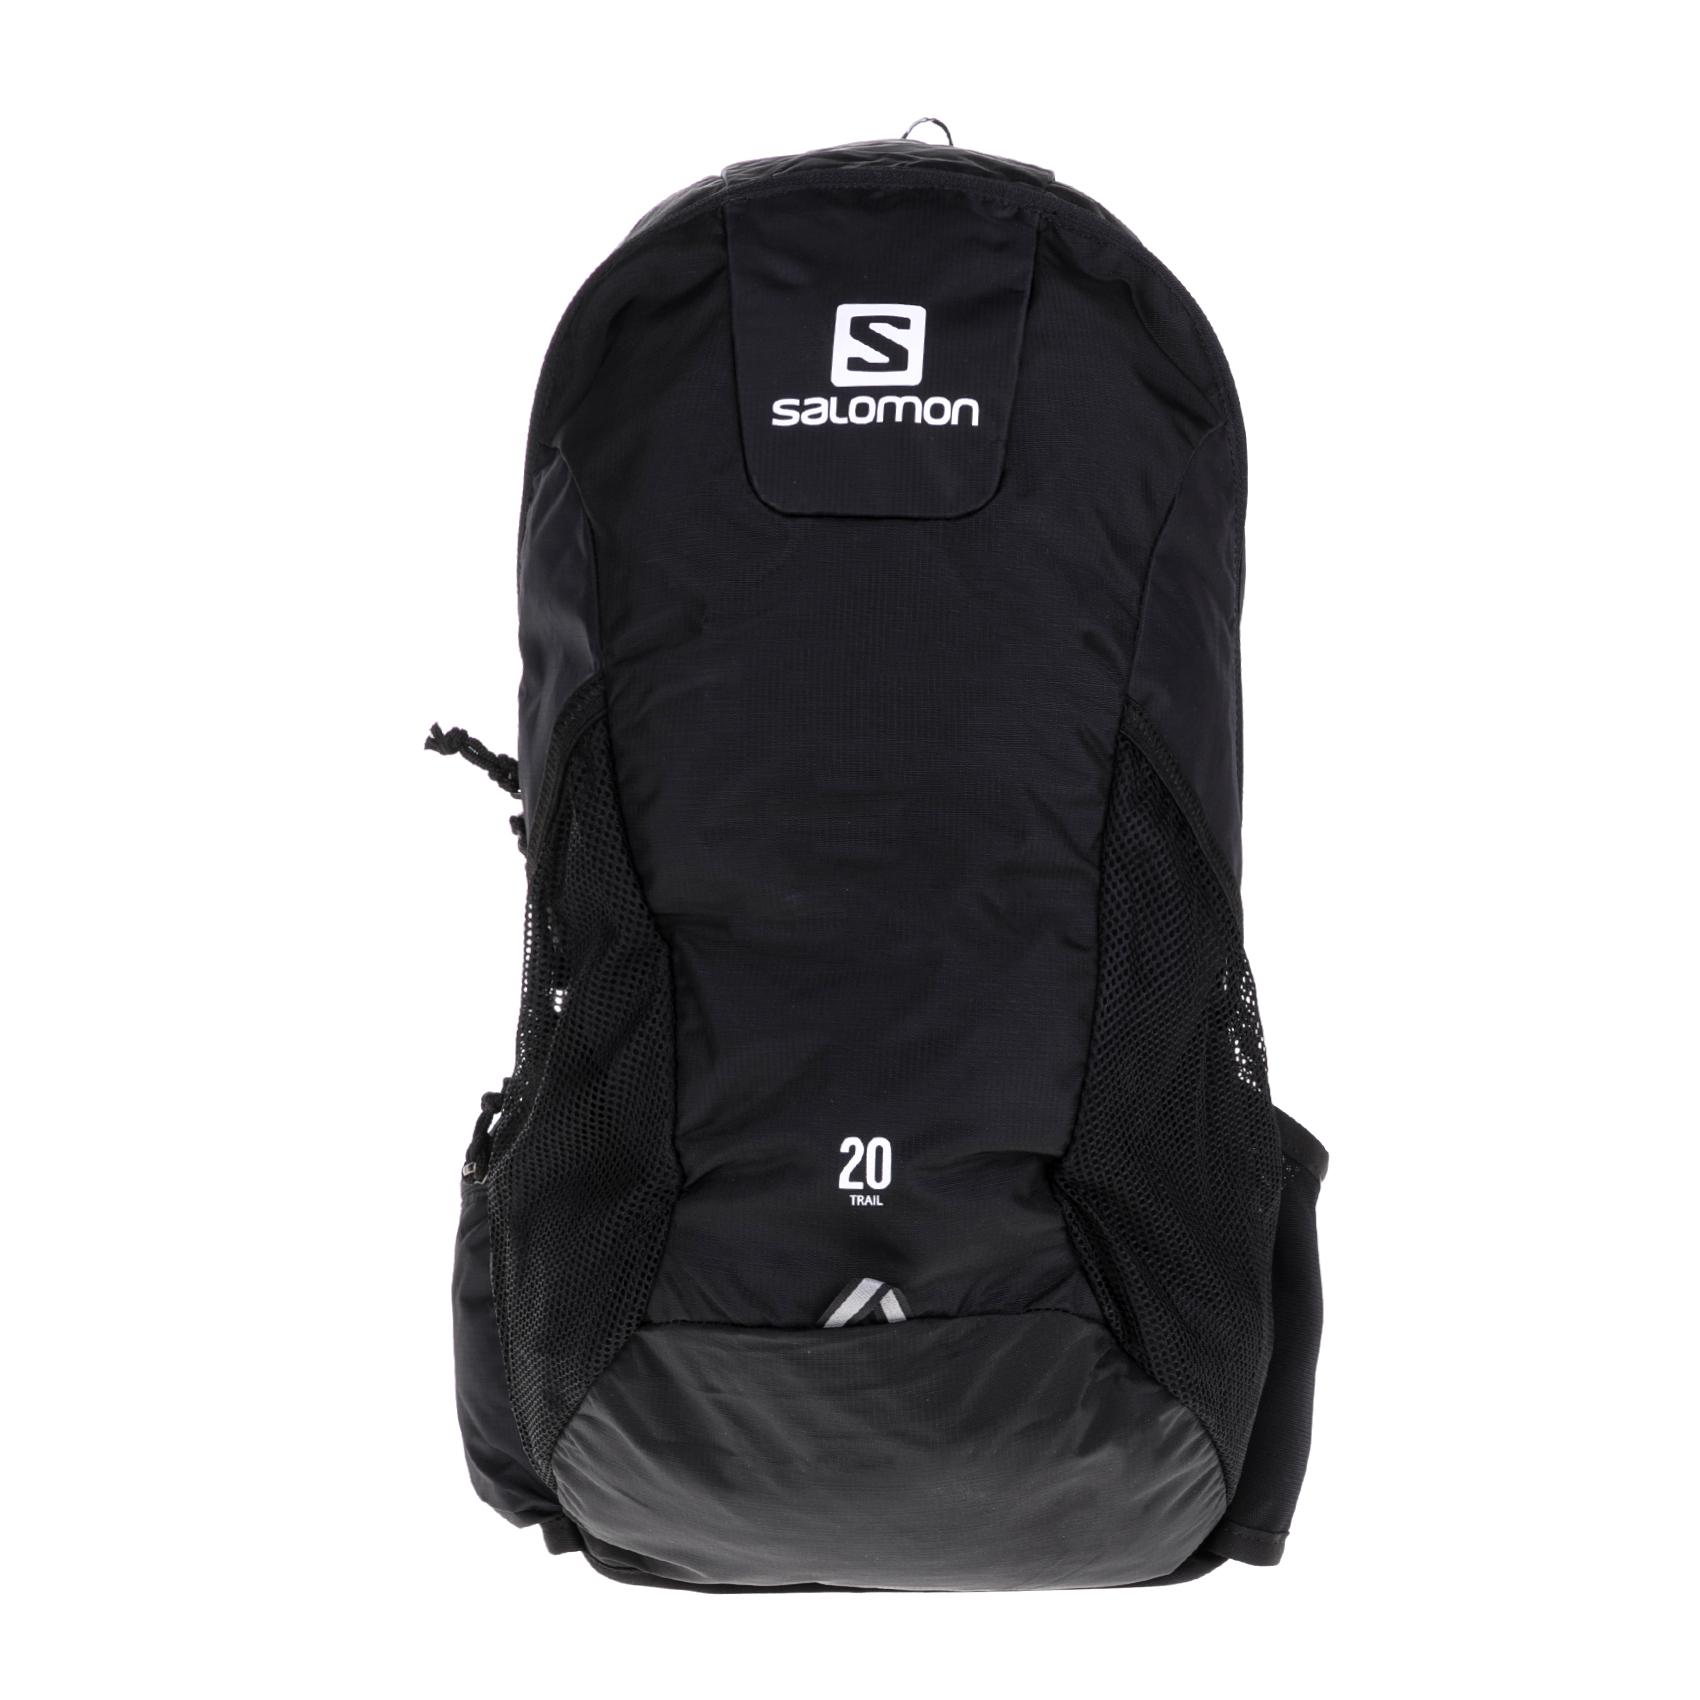 SALOMON - Σακίδιο πλάτης SALOMON PACKS BAG TRAIL 20 B μαύρο γυναικεία αξεσουάρ τσάντες σακίδια πλάτης